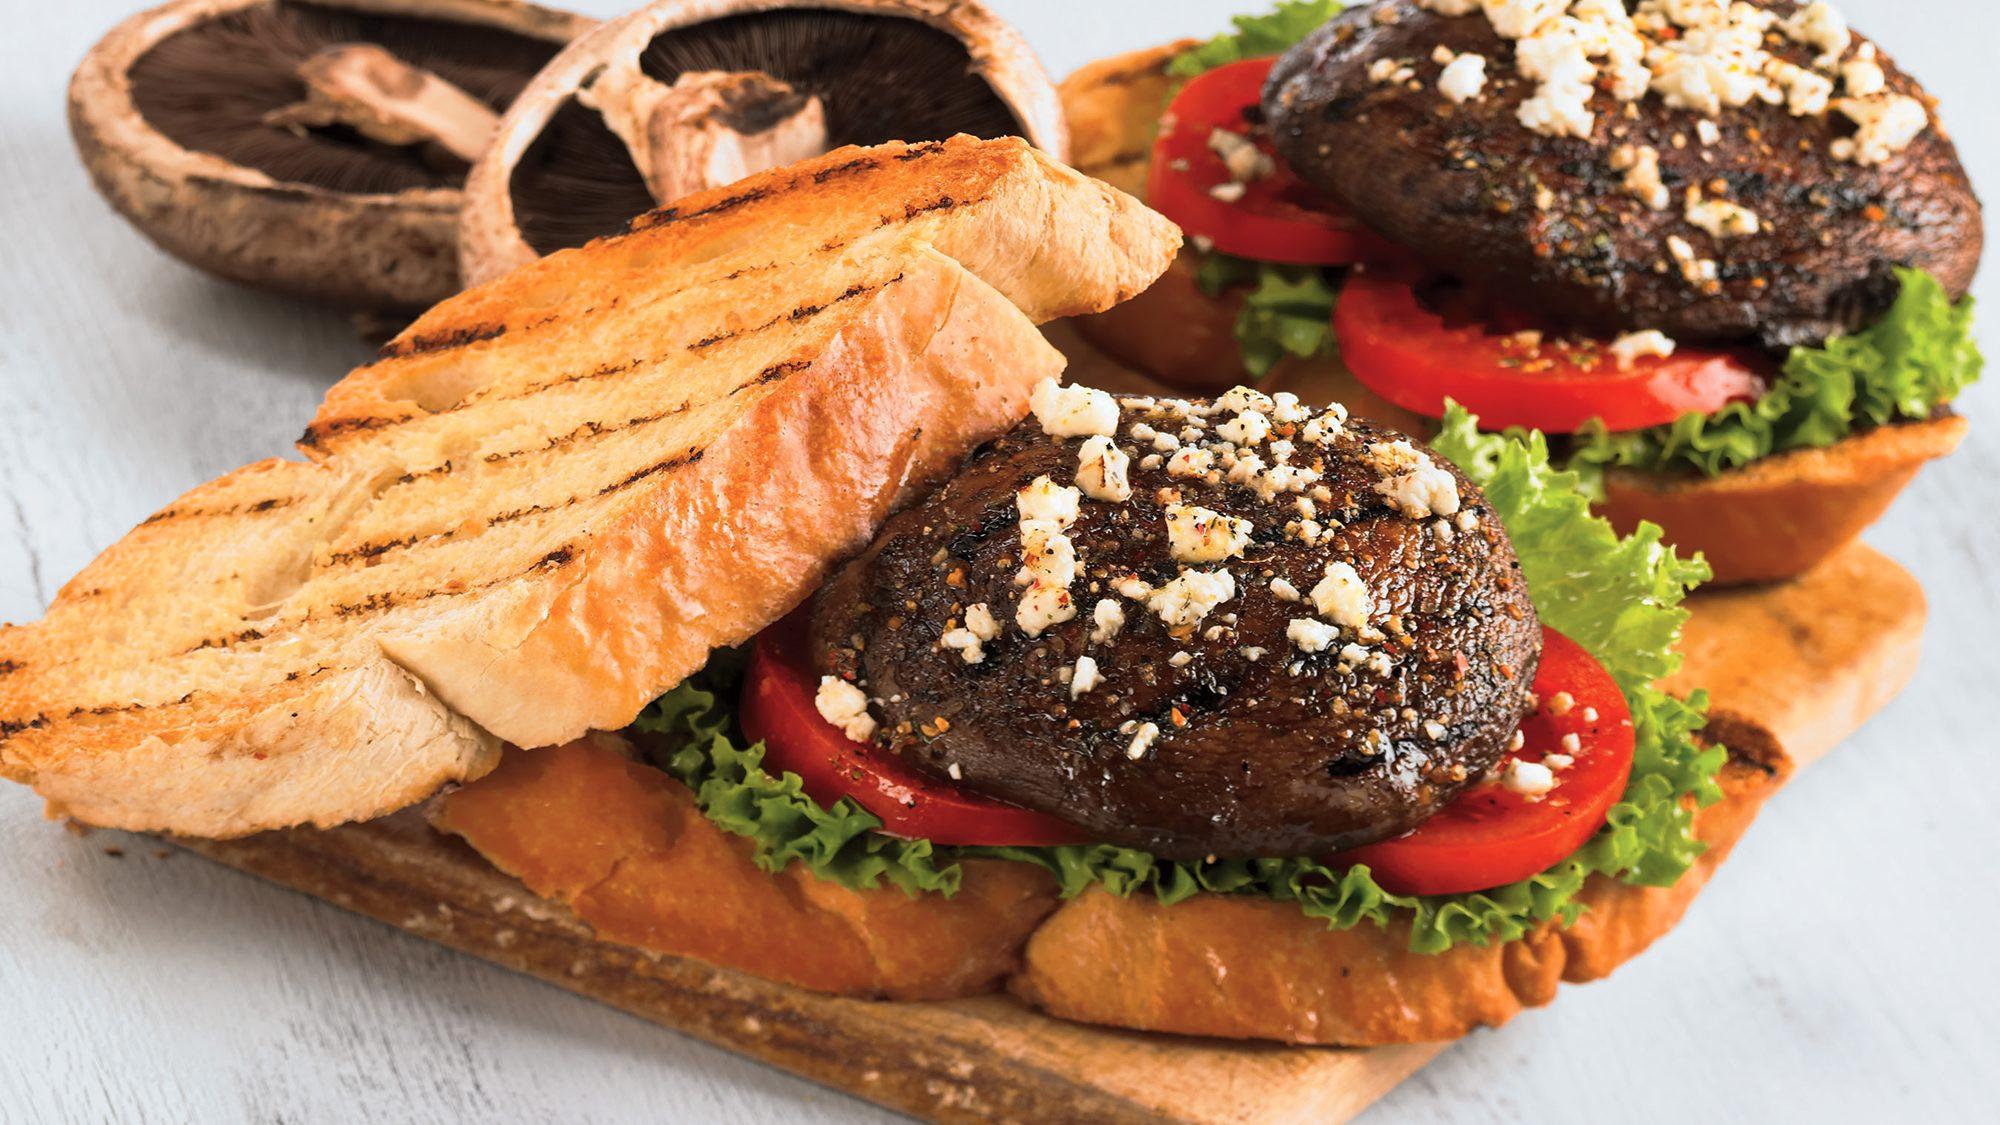 McCormick GrillMates Grilled Portobello Mushroom Panini